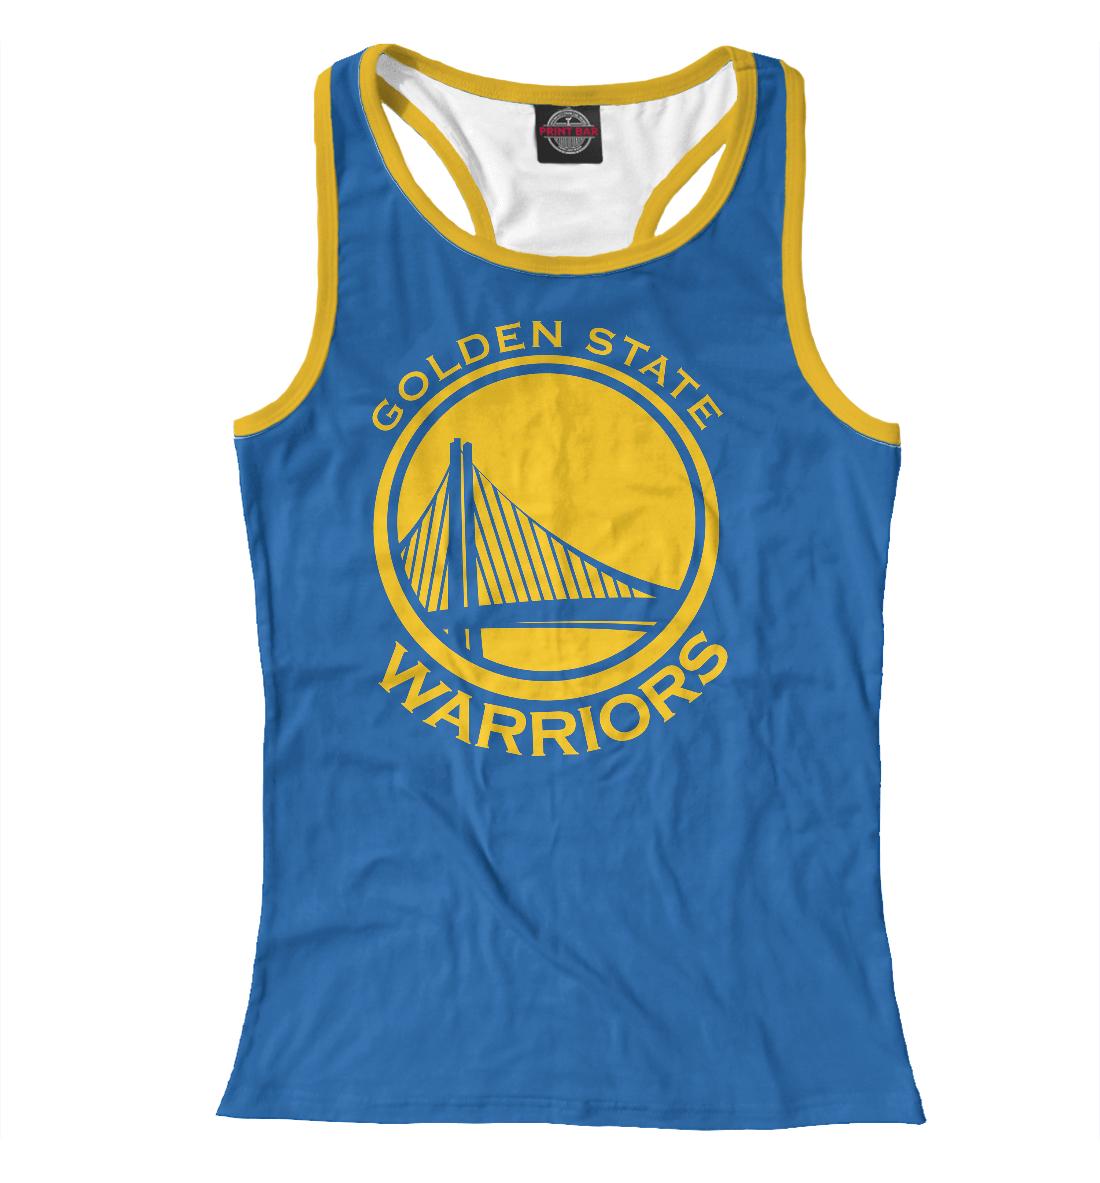 Купить Golden State Warriors, Printbar, Майки борцовки, NBA-677168-mayb-1